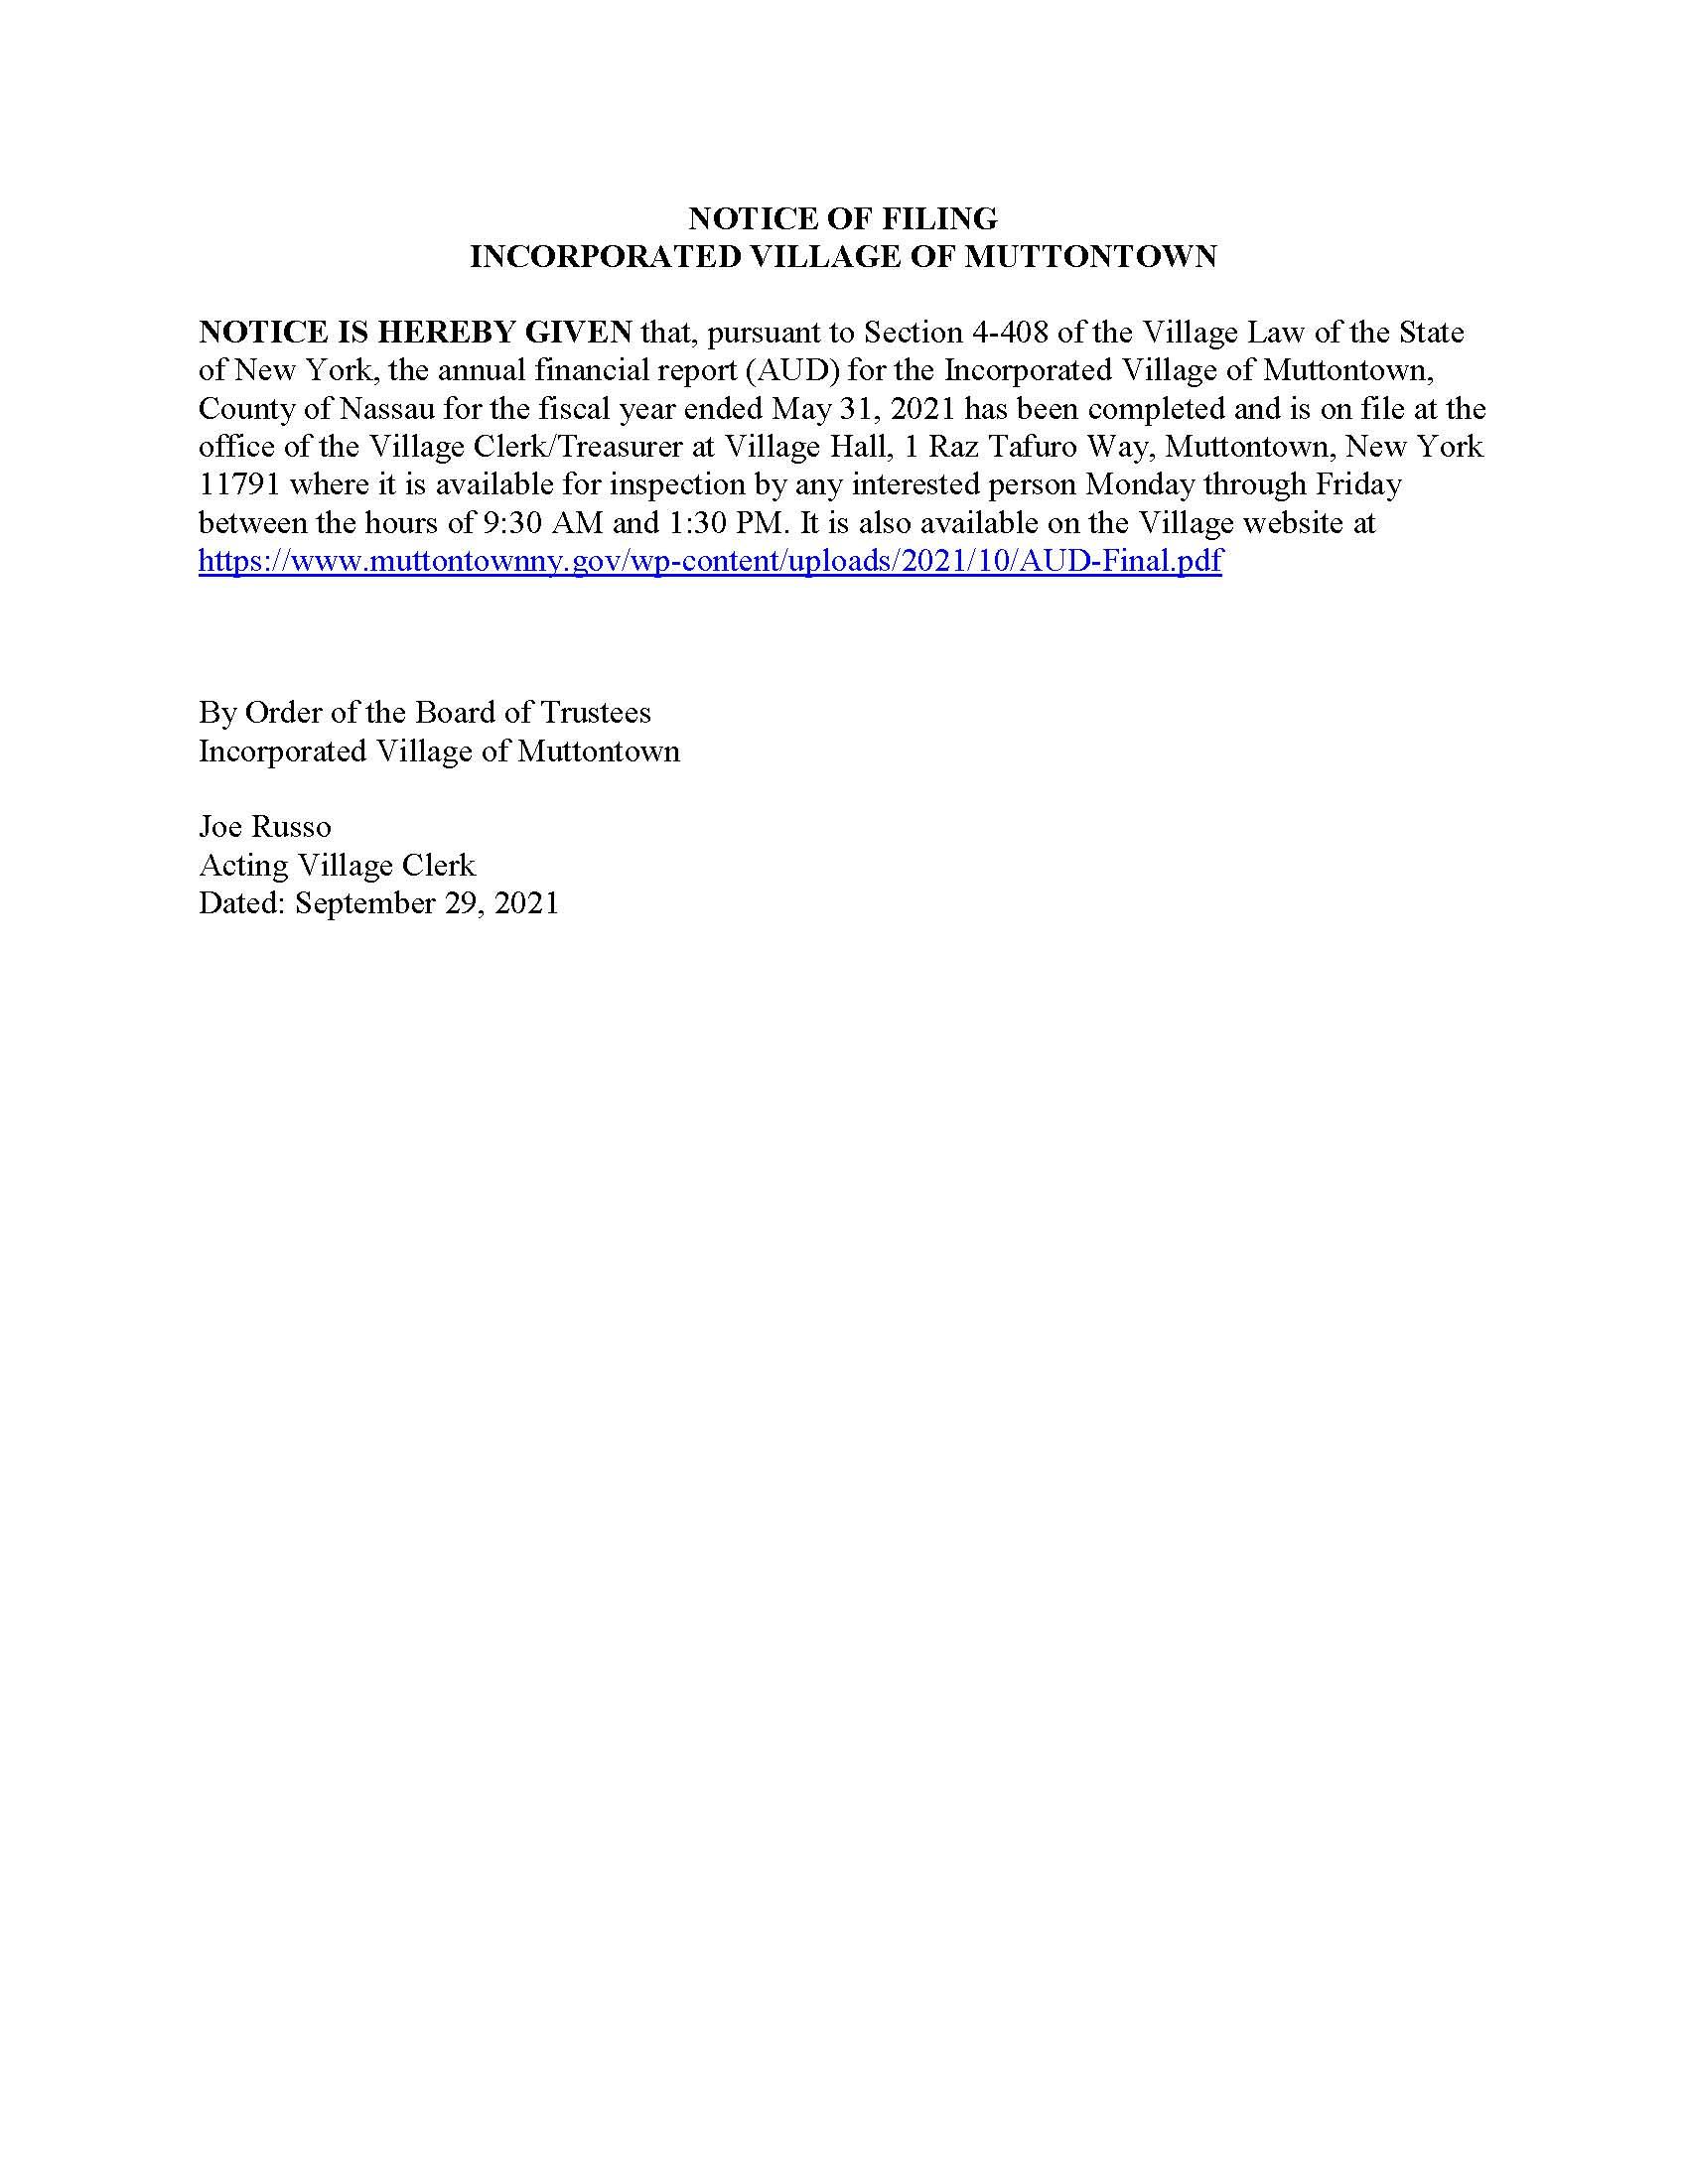 Notice of Filing